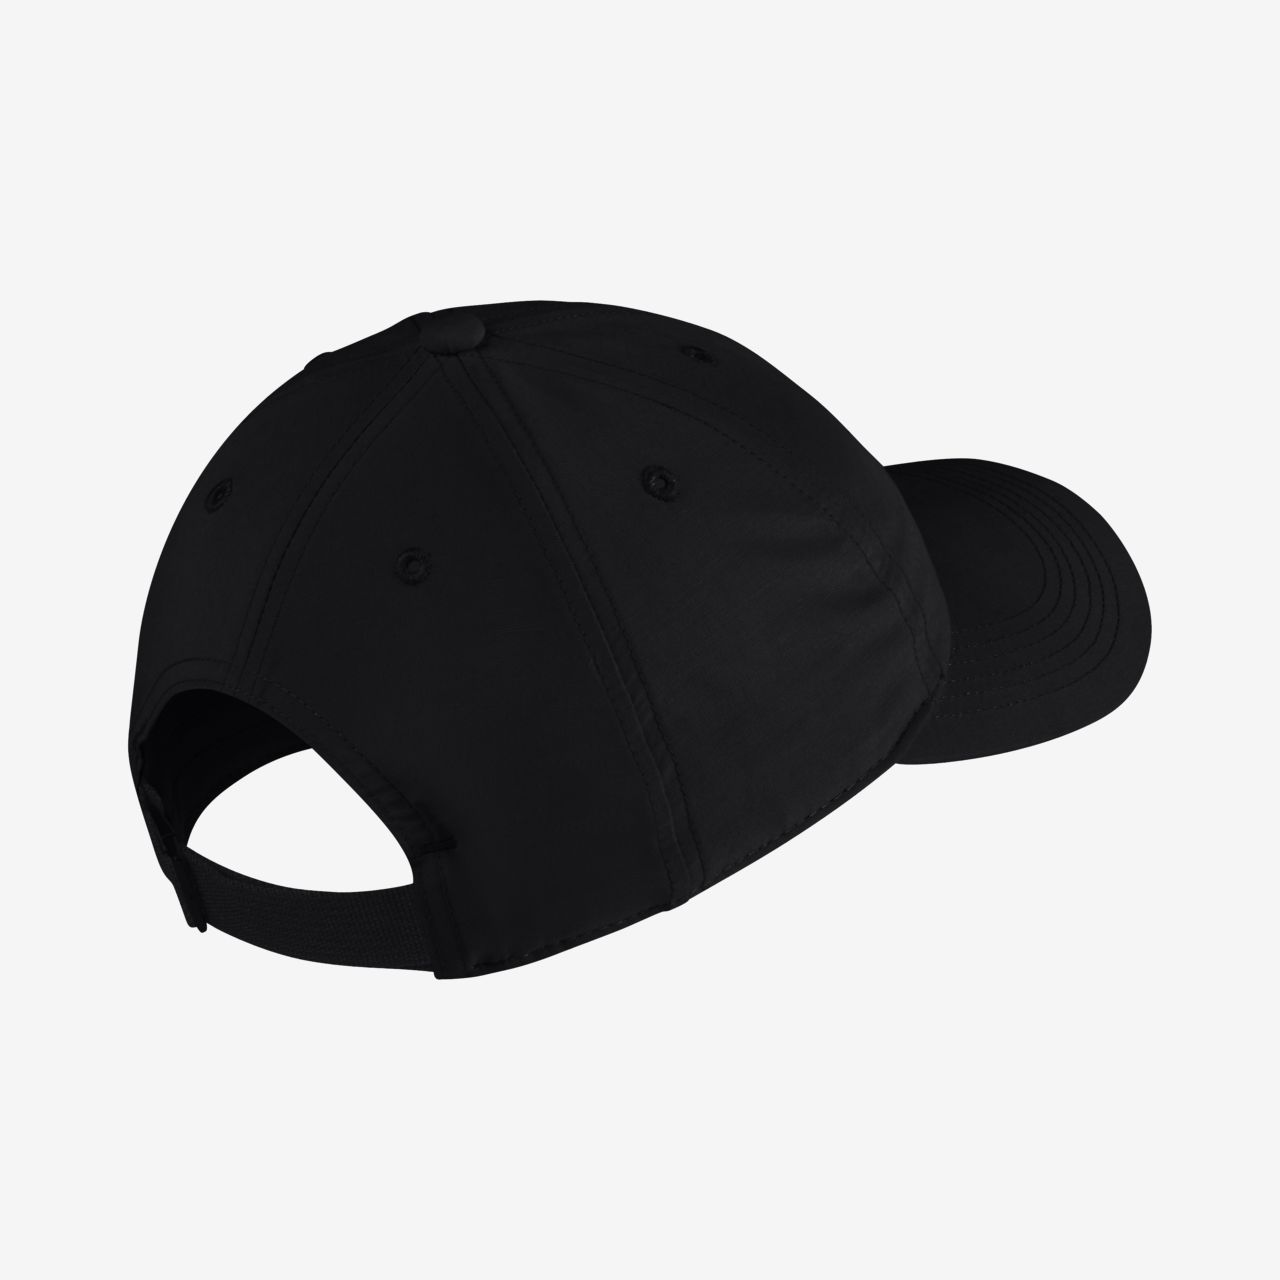 a503bef7412 Nike Metal Swoosh Big Kids  Adjustable Hat. Nike.com